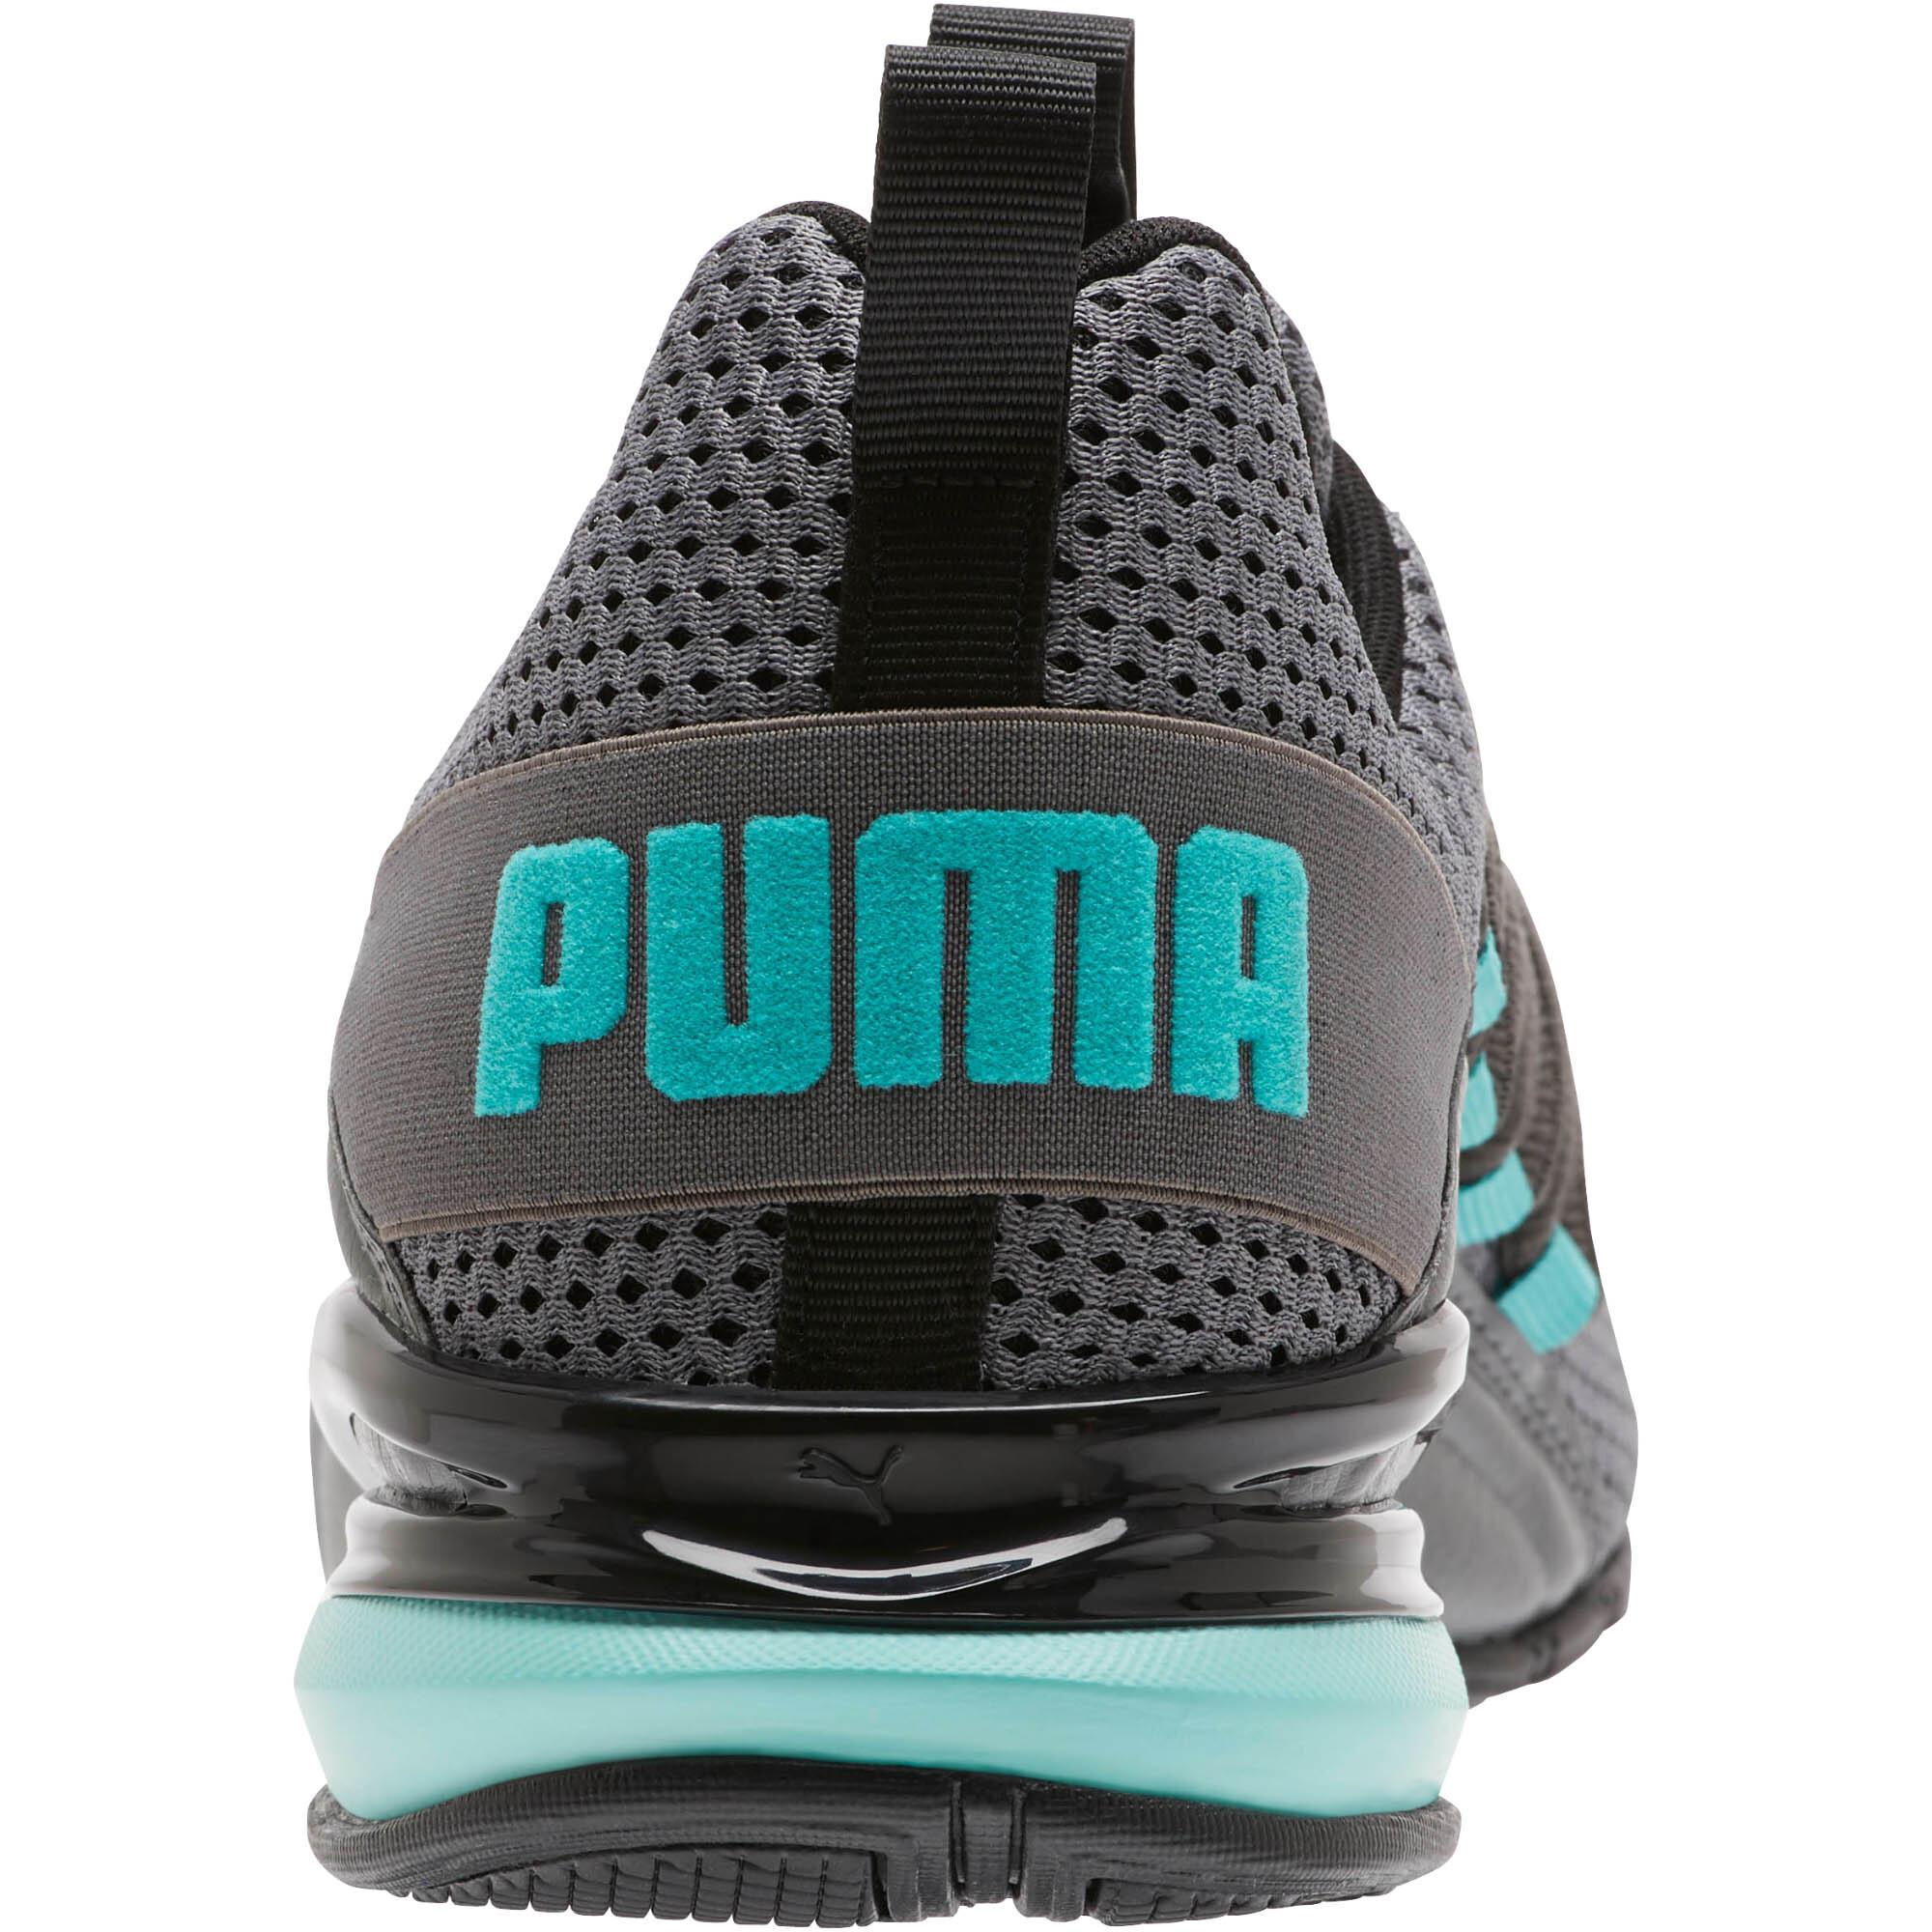 PUMA-Axelion-Breathe-Men-s-Training-Shoes-Men-Shoe-Running thumbnail 8